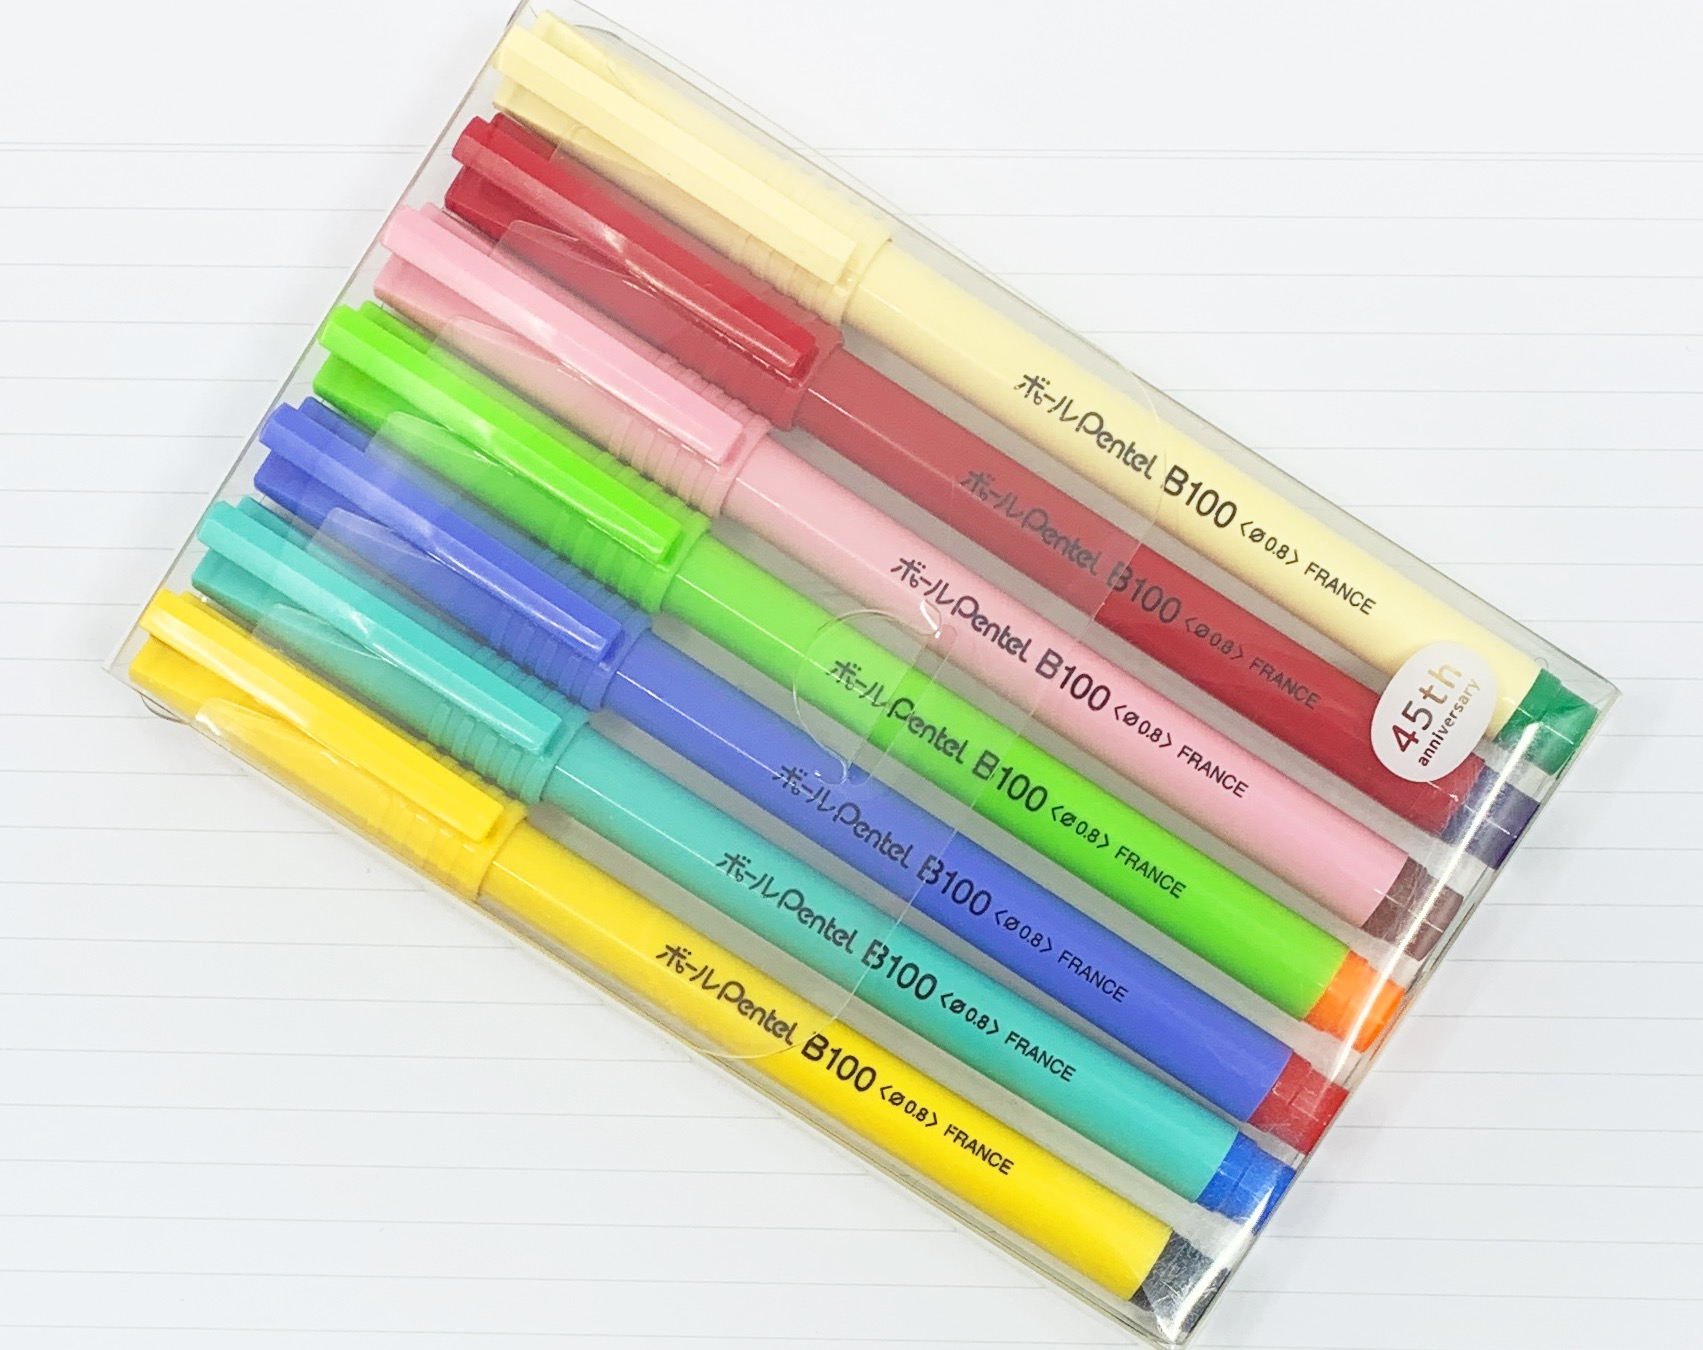 Pentel B100 45th Anniversary Pen Set Review